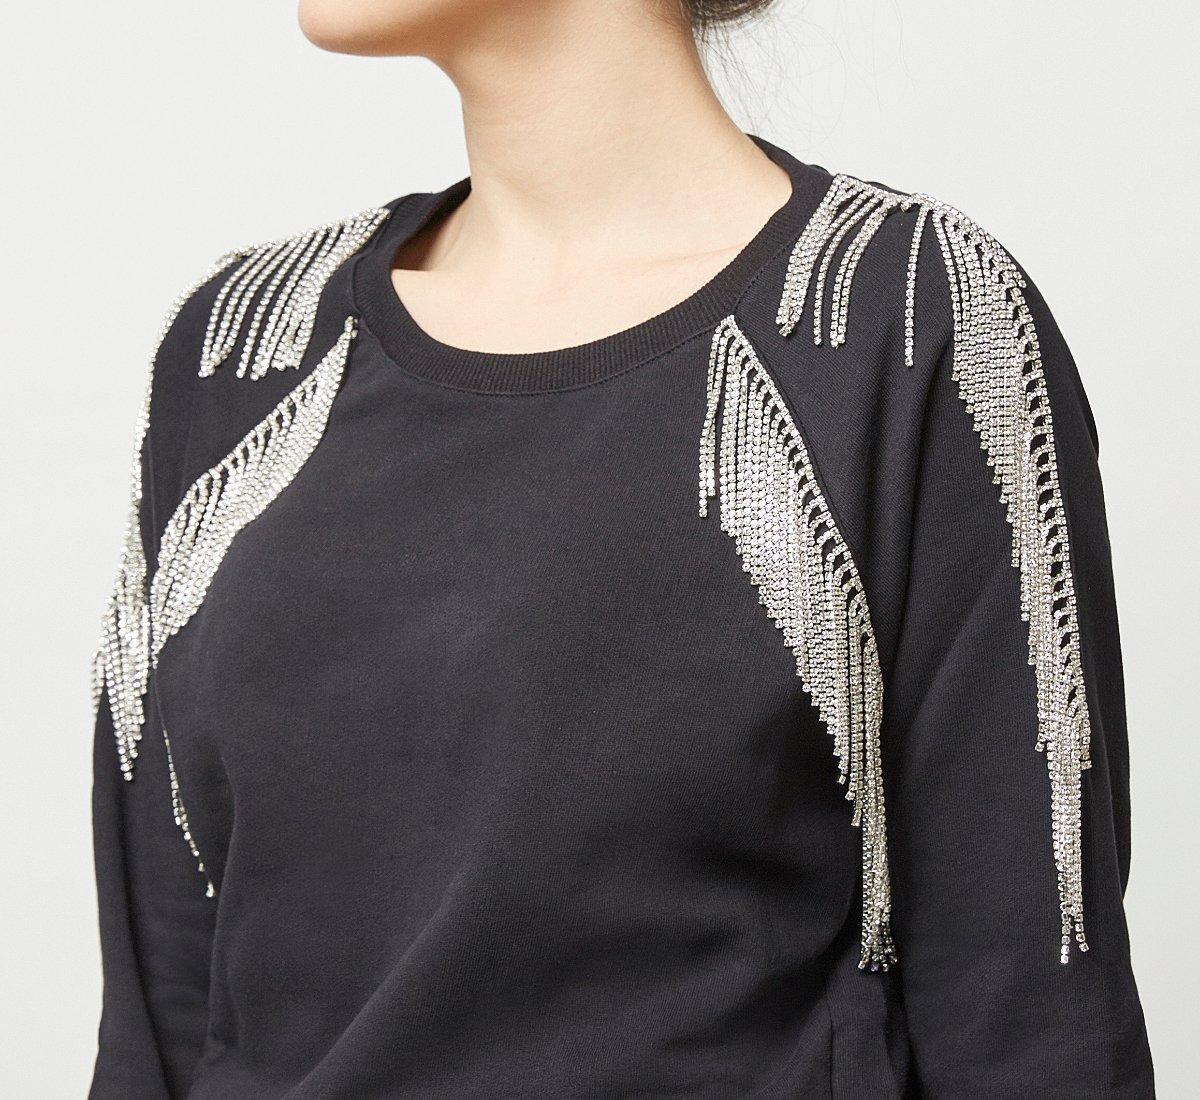 Cotton sweater with rhinestones